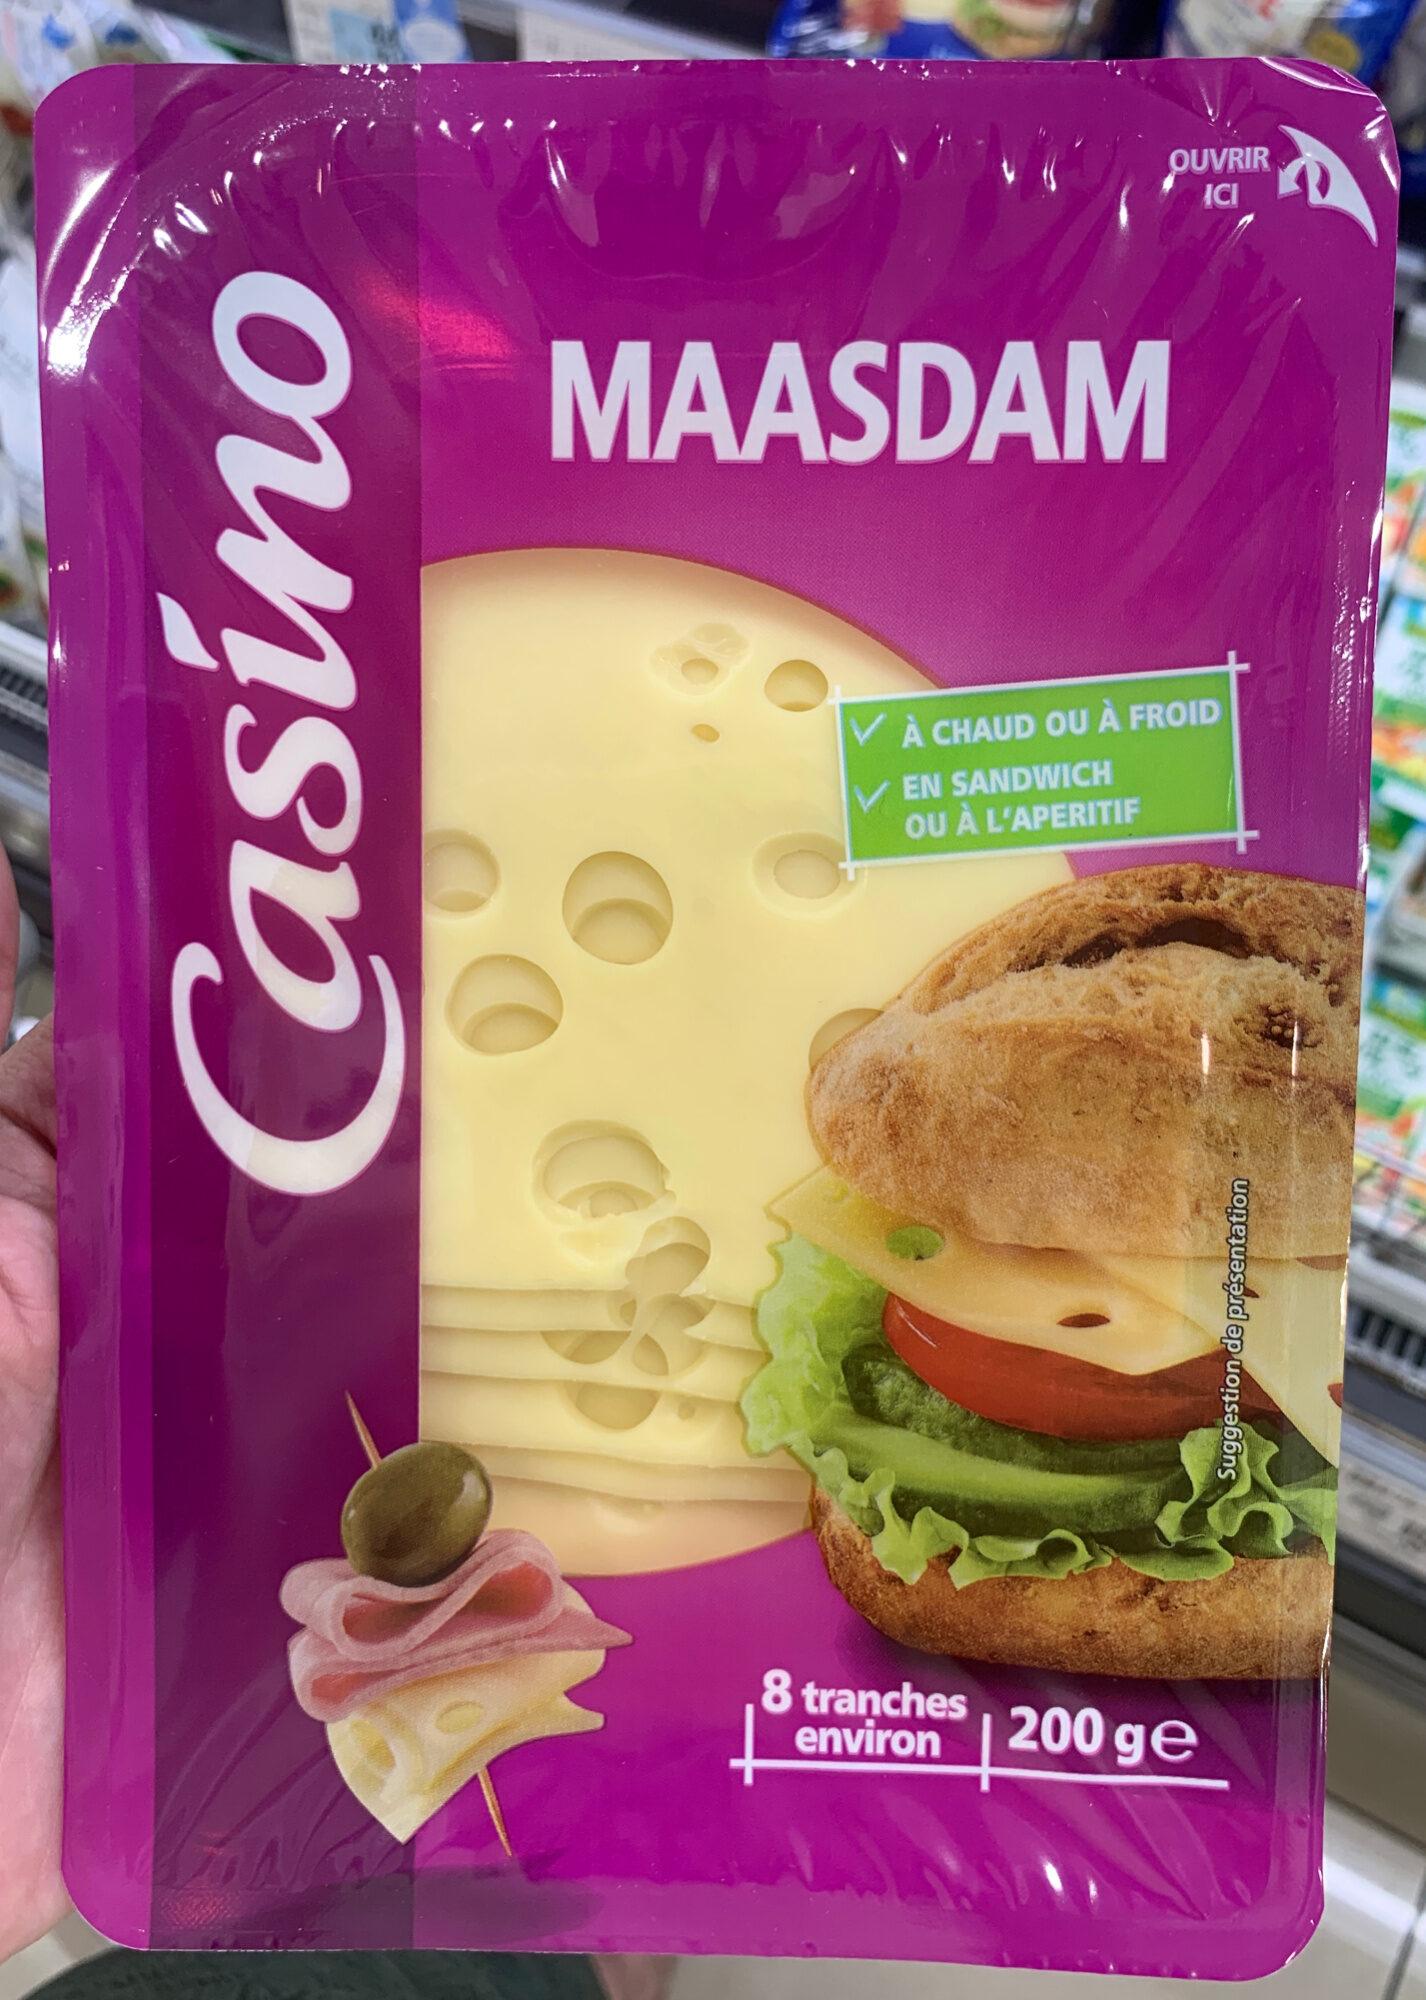 Maasdam - 8 tranches environ - 製品 - ja